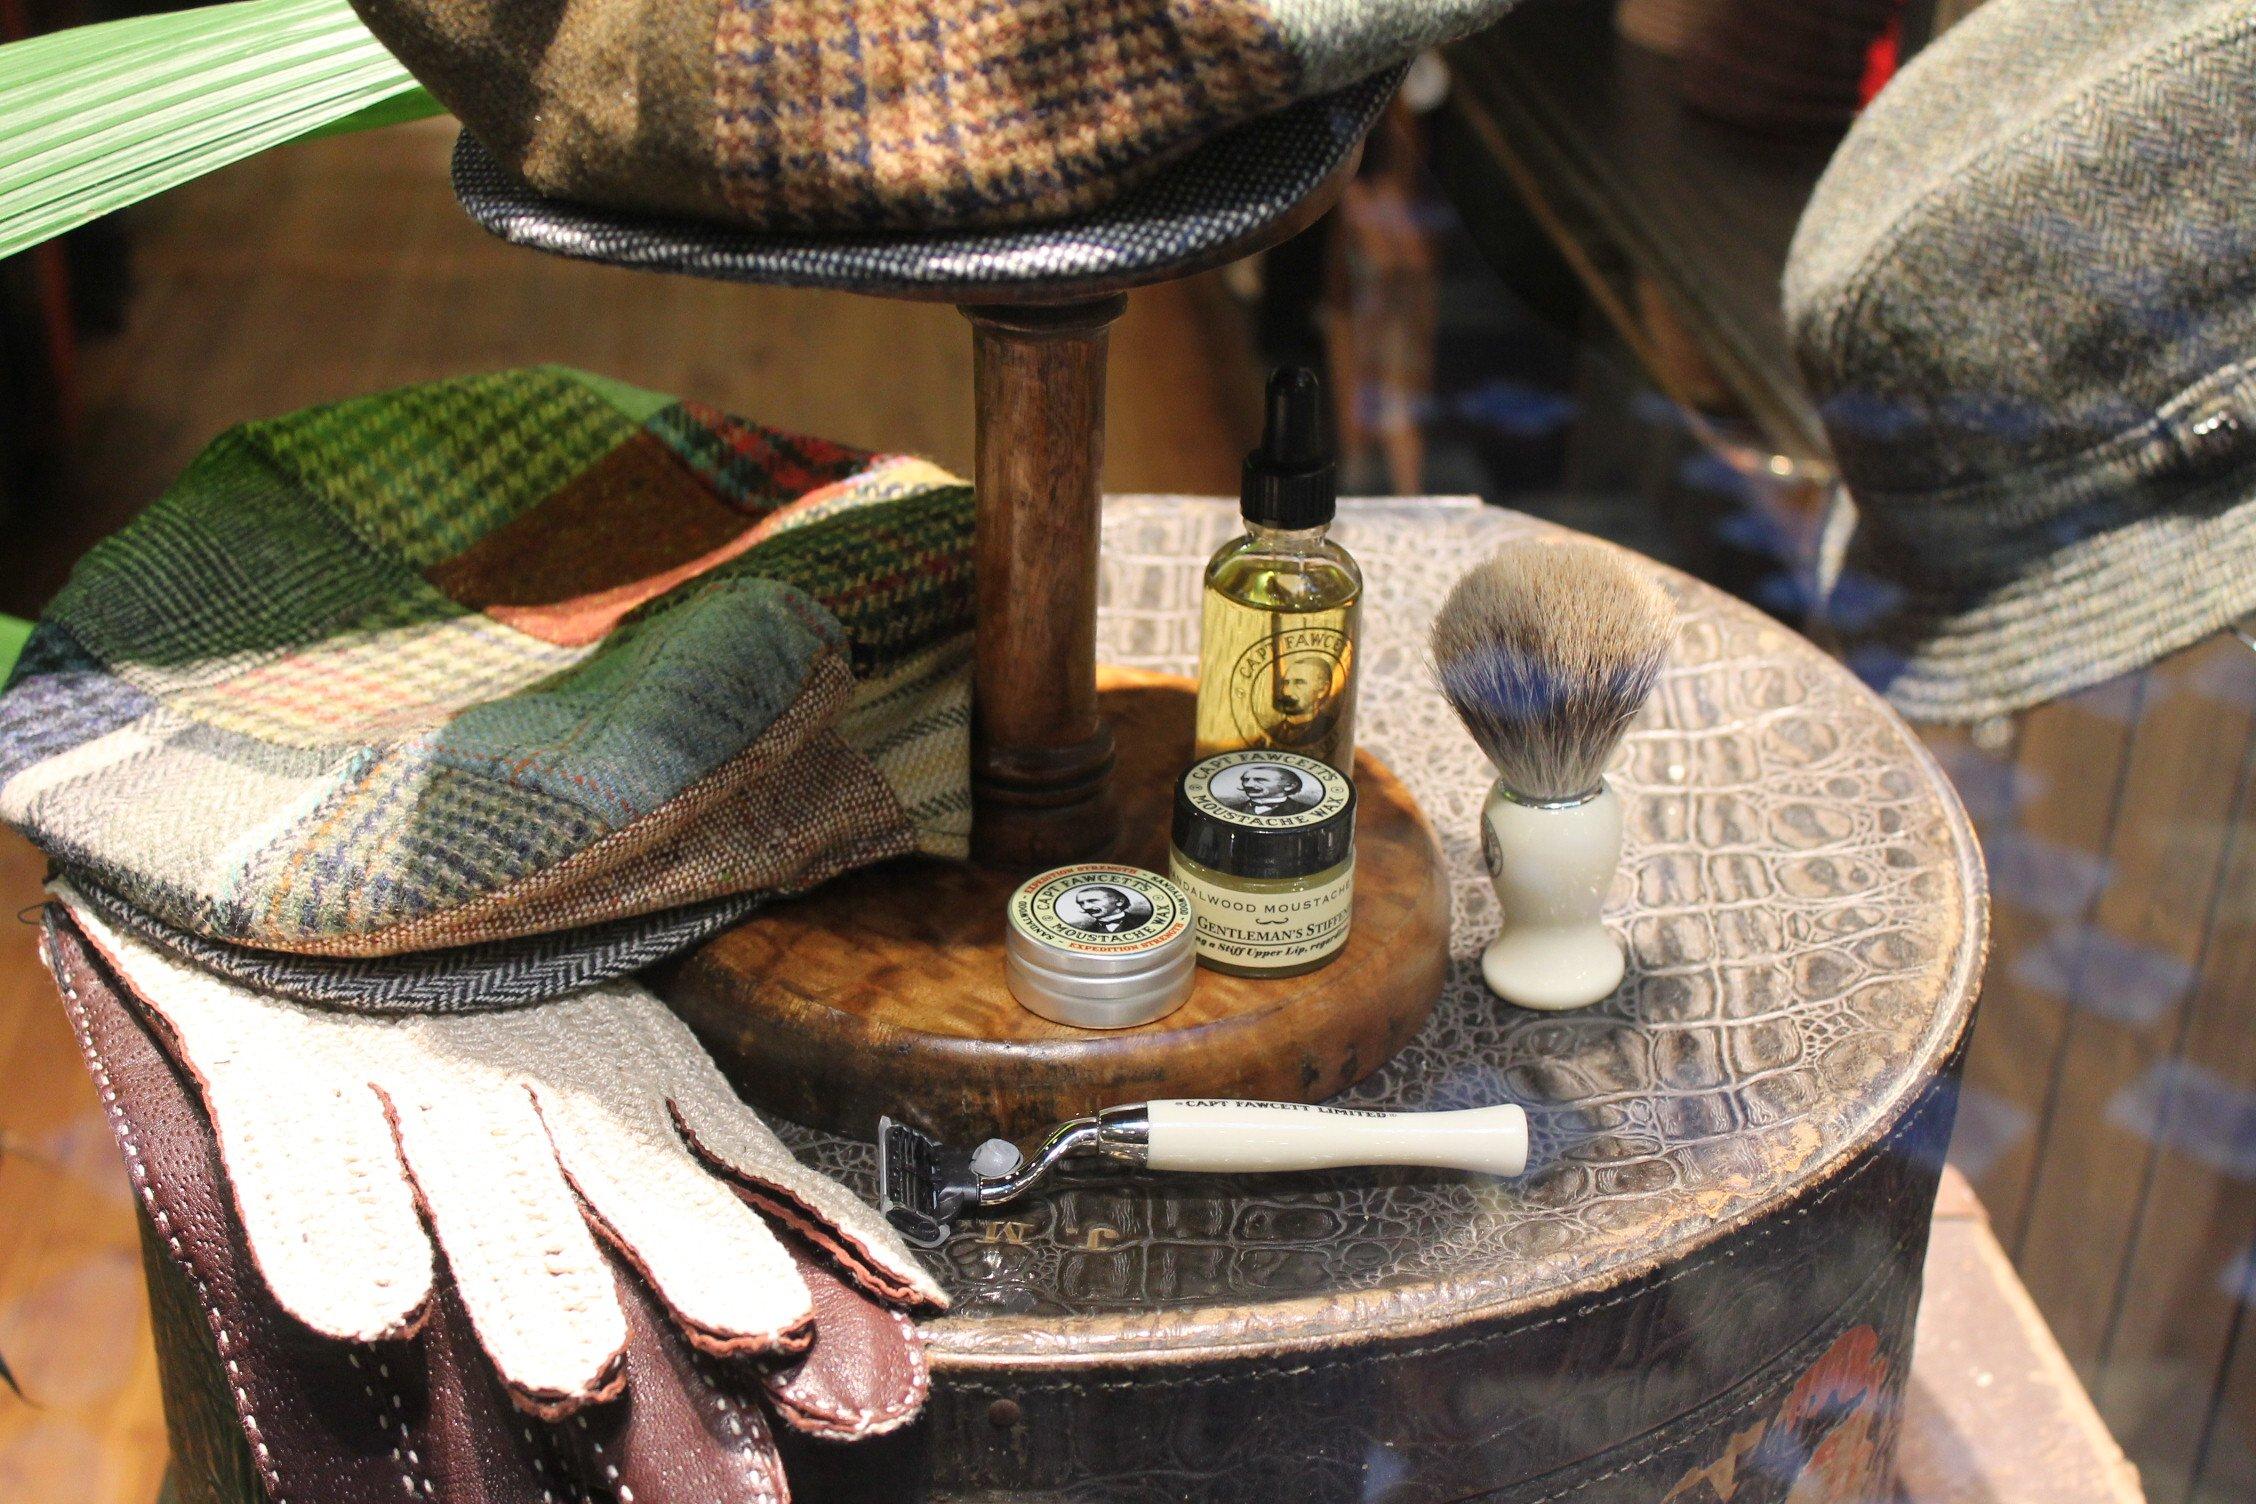 CAPTAIN FAWCETT Beard Oil Private Stock 50ml Made in England by CAPTAIN FAWCETT